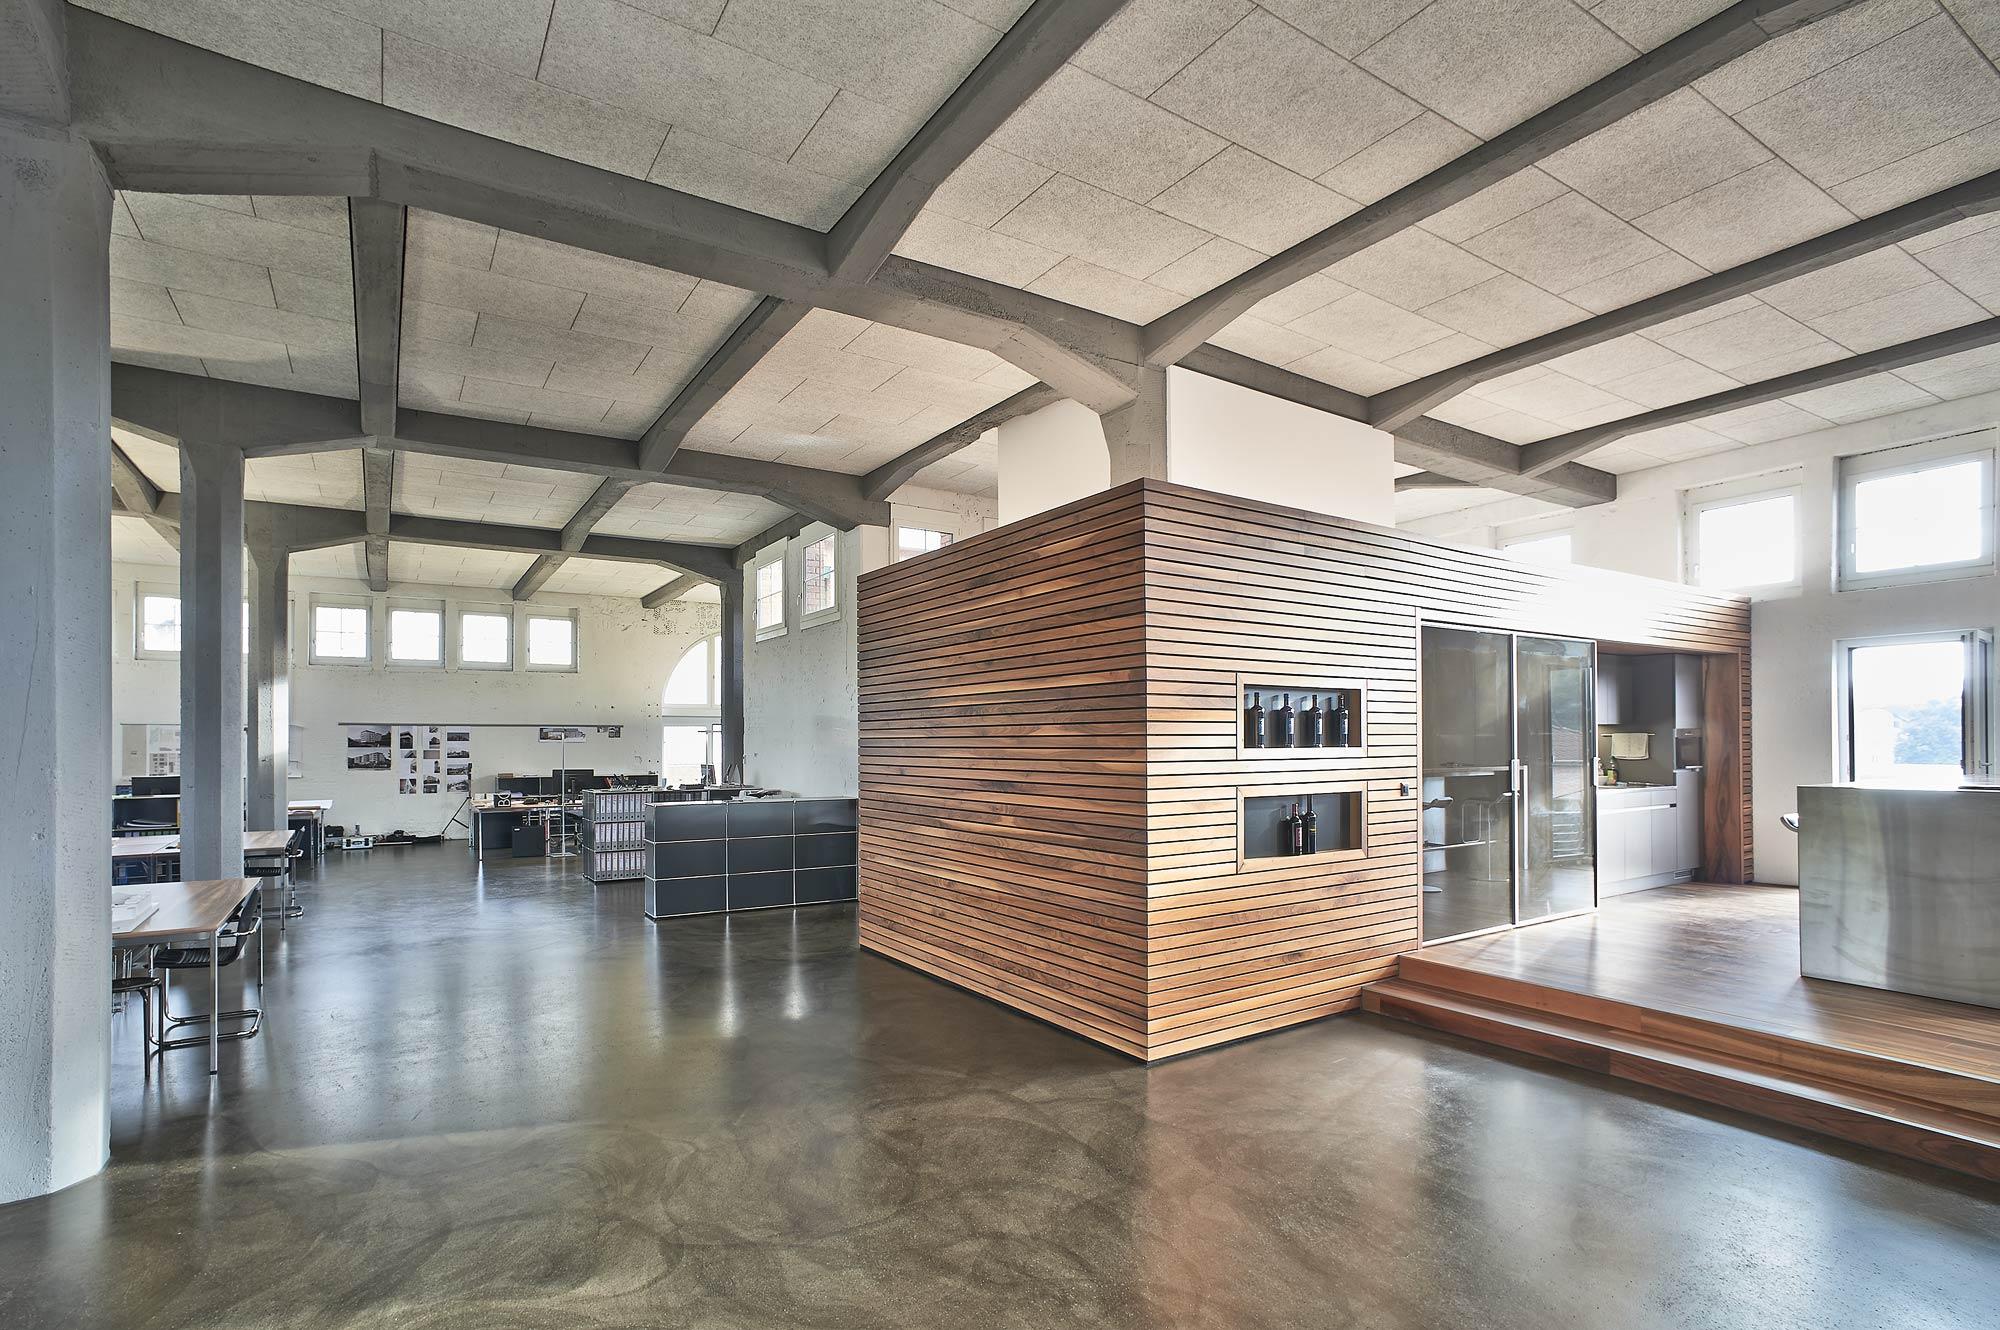 b ro rogger ambauen ag. Black Bedroom Furniture Sets. Home Design Ideas